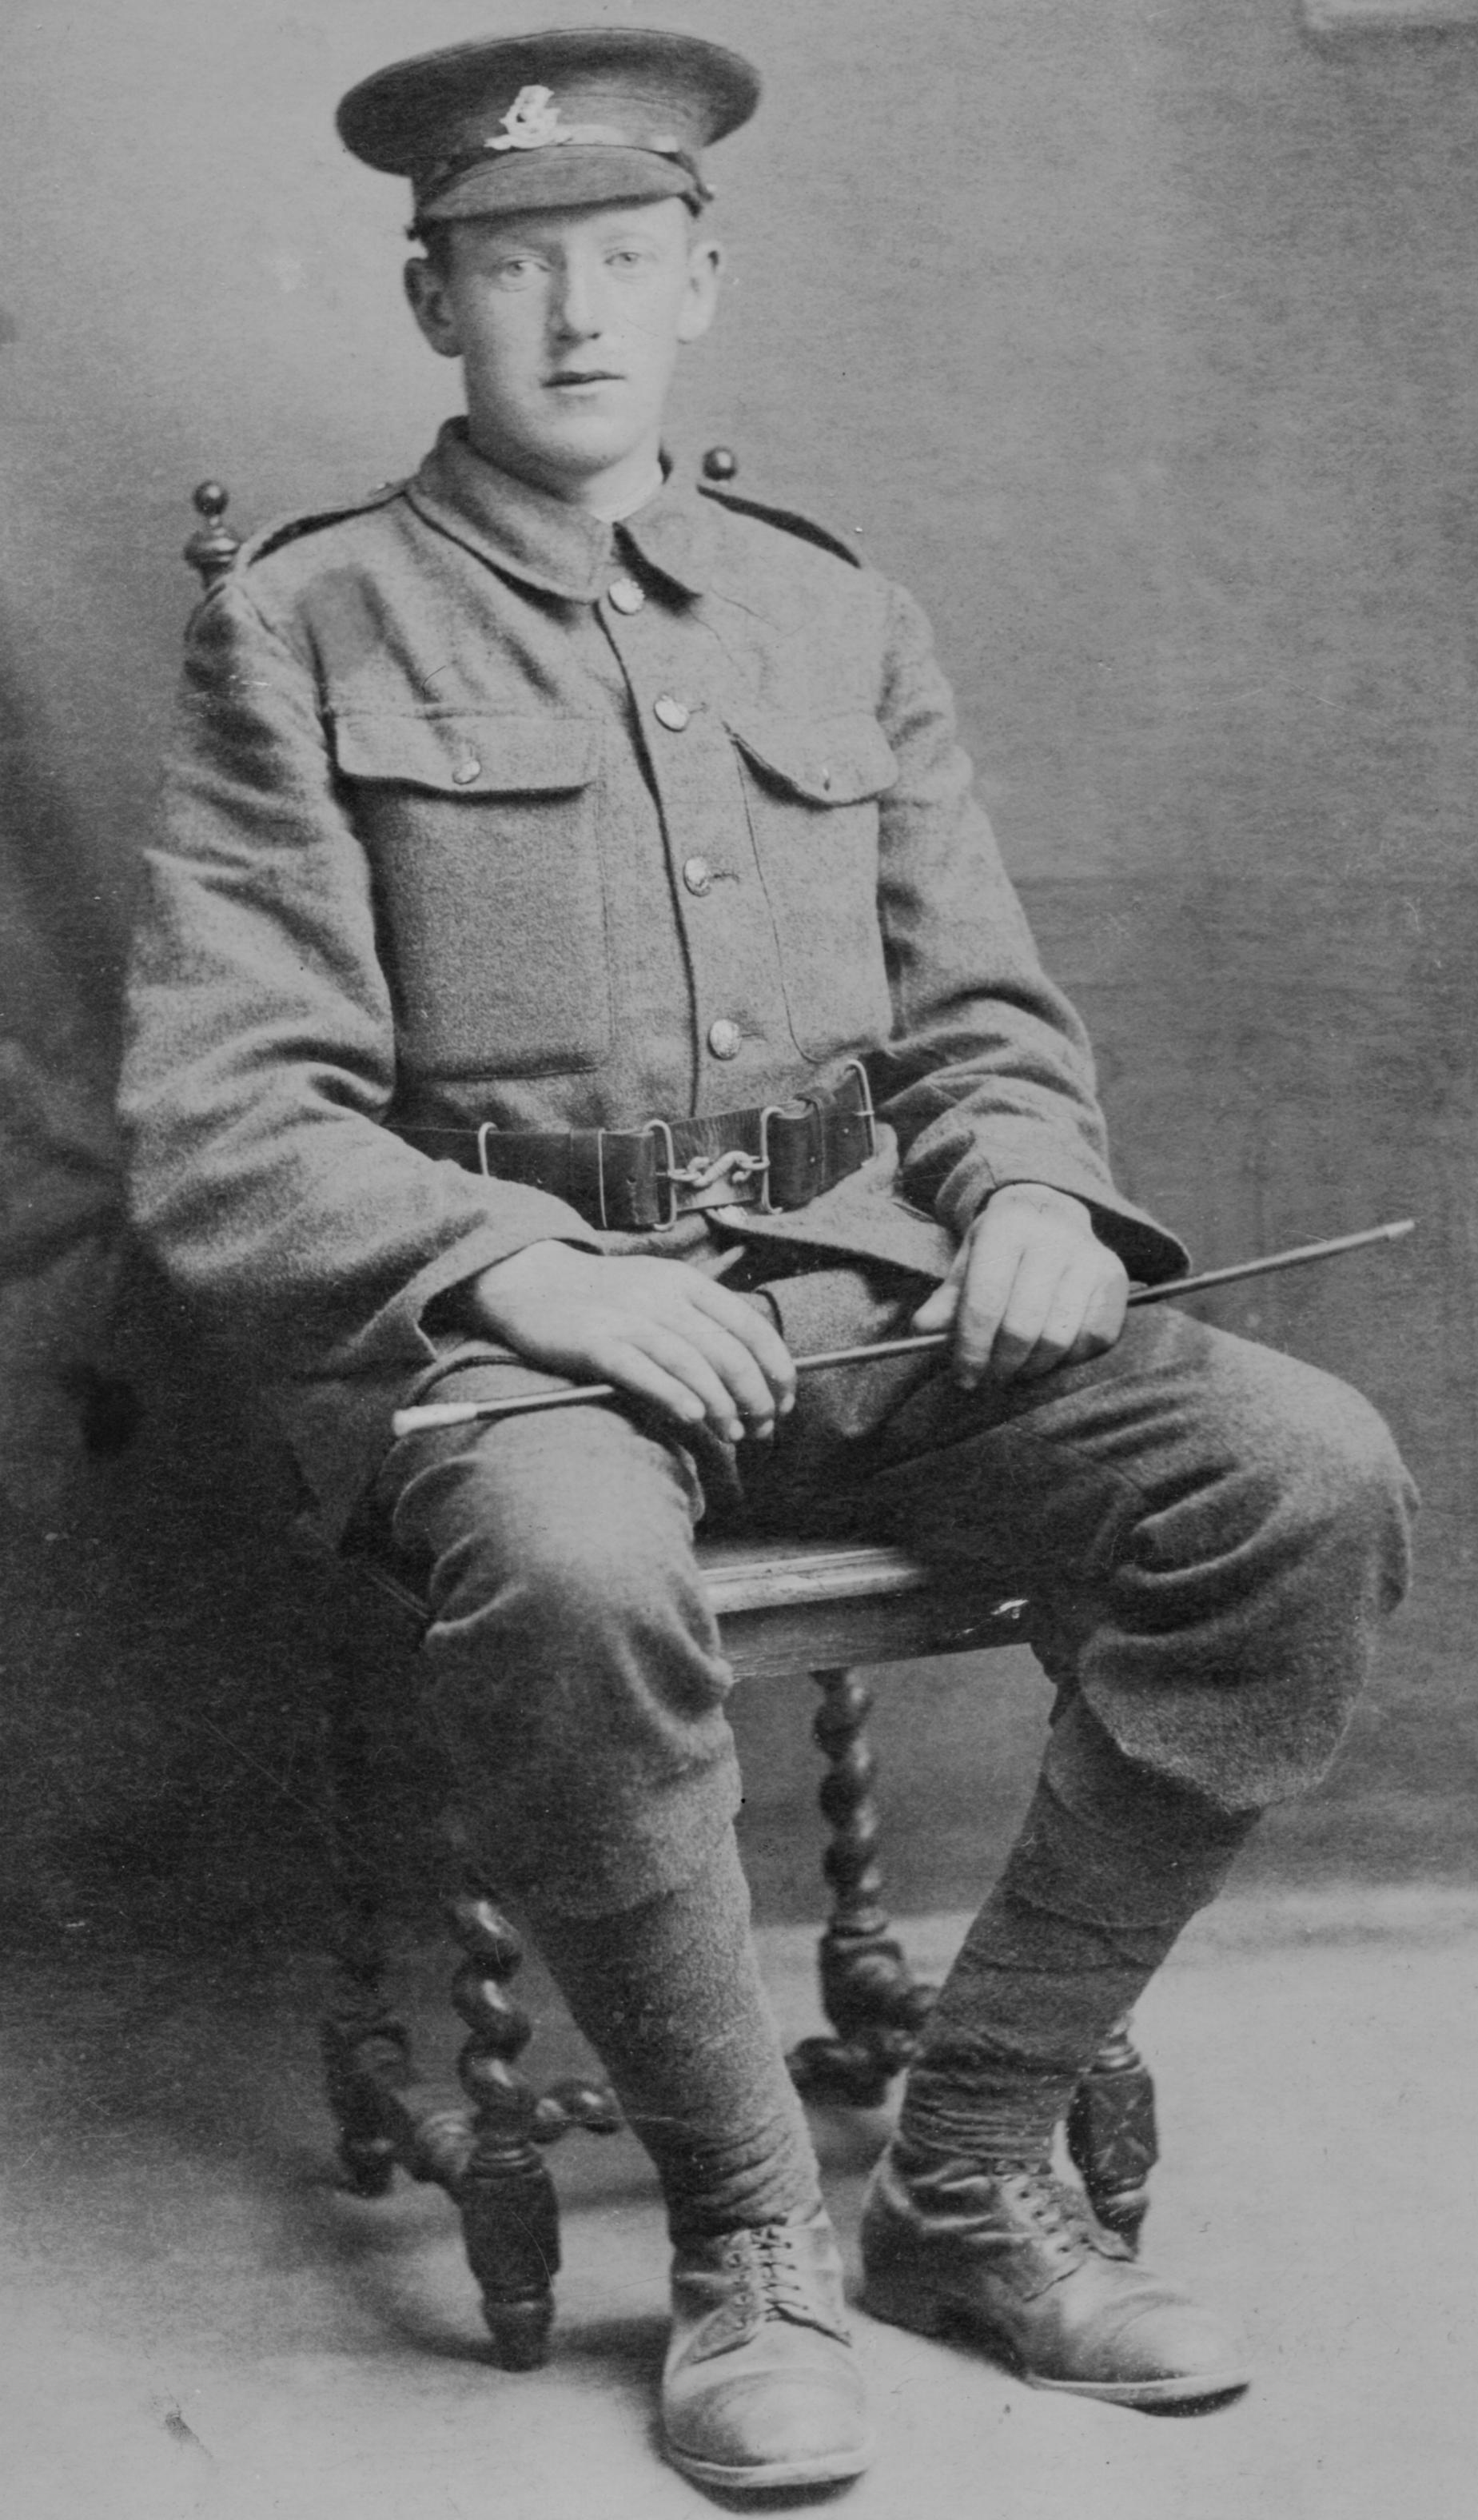 John William Whitfield